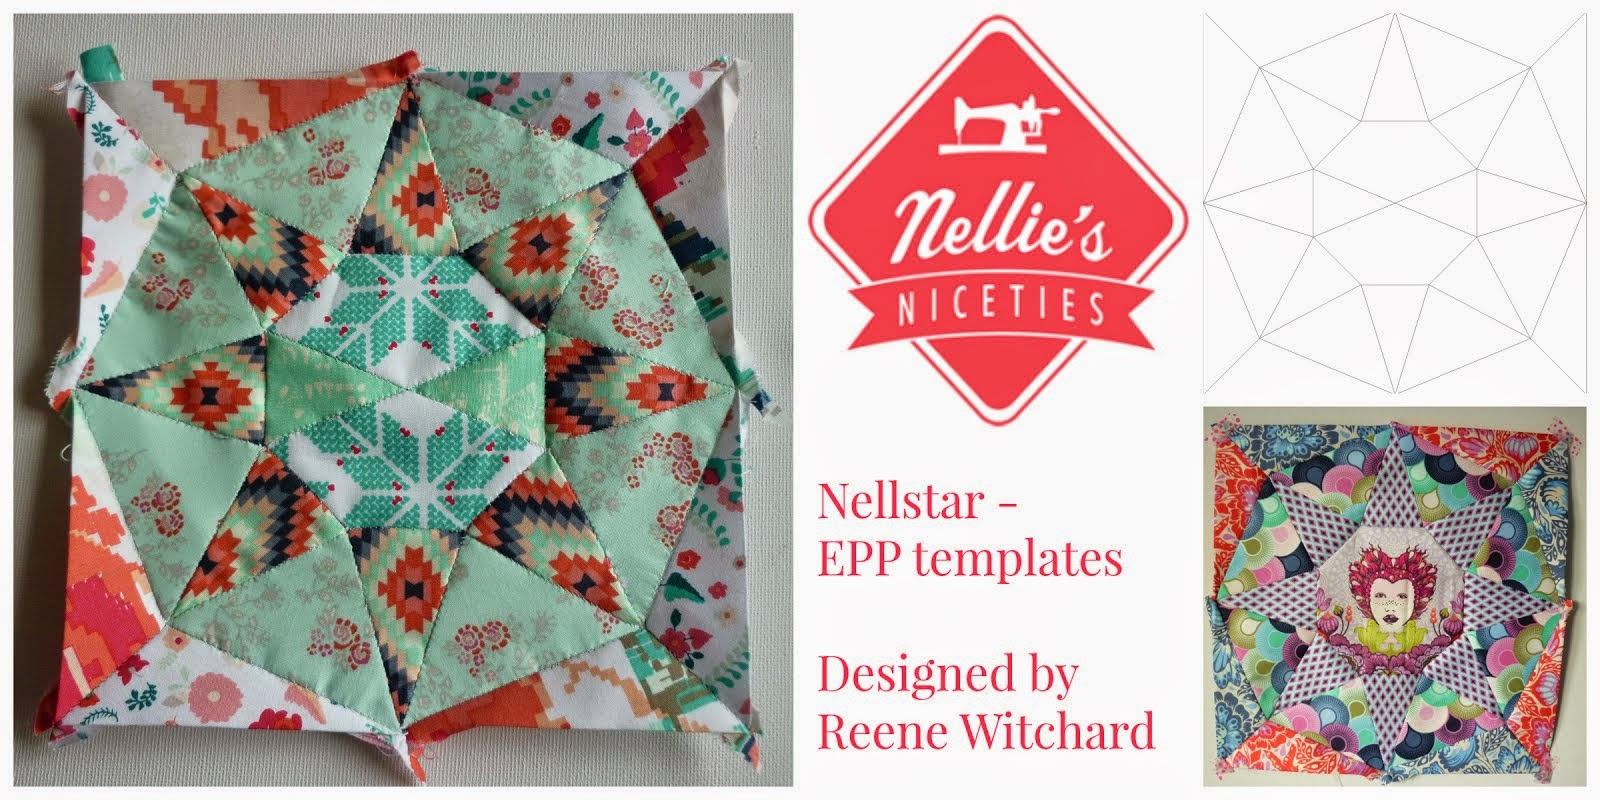 Nellstar EPP templates